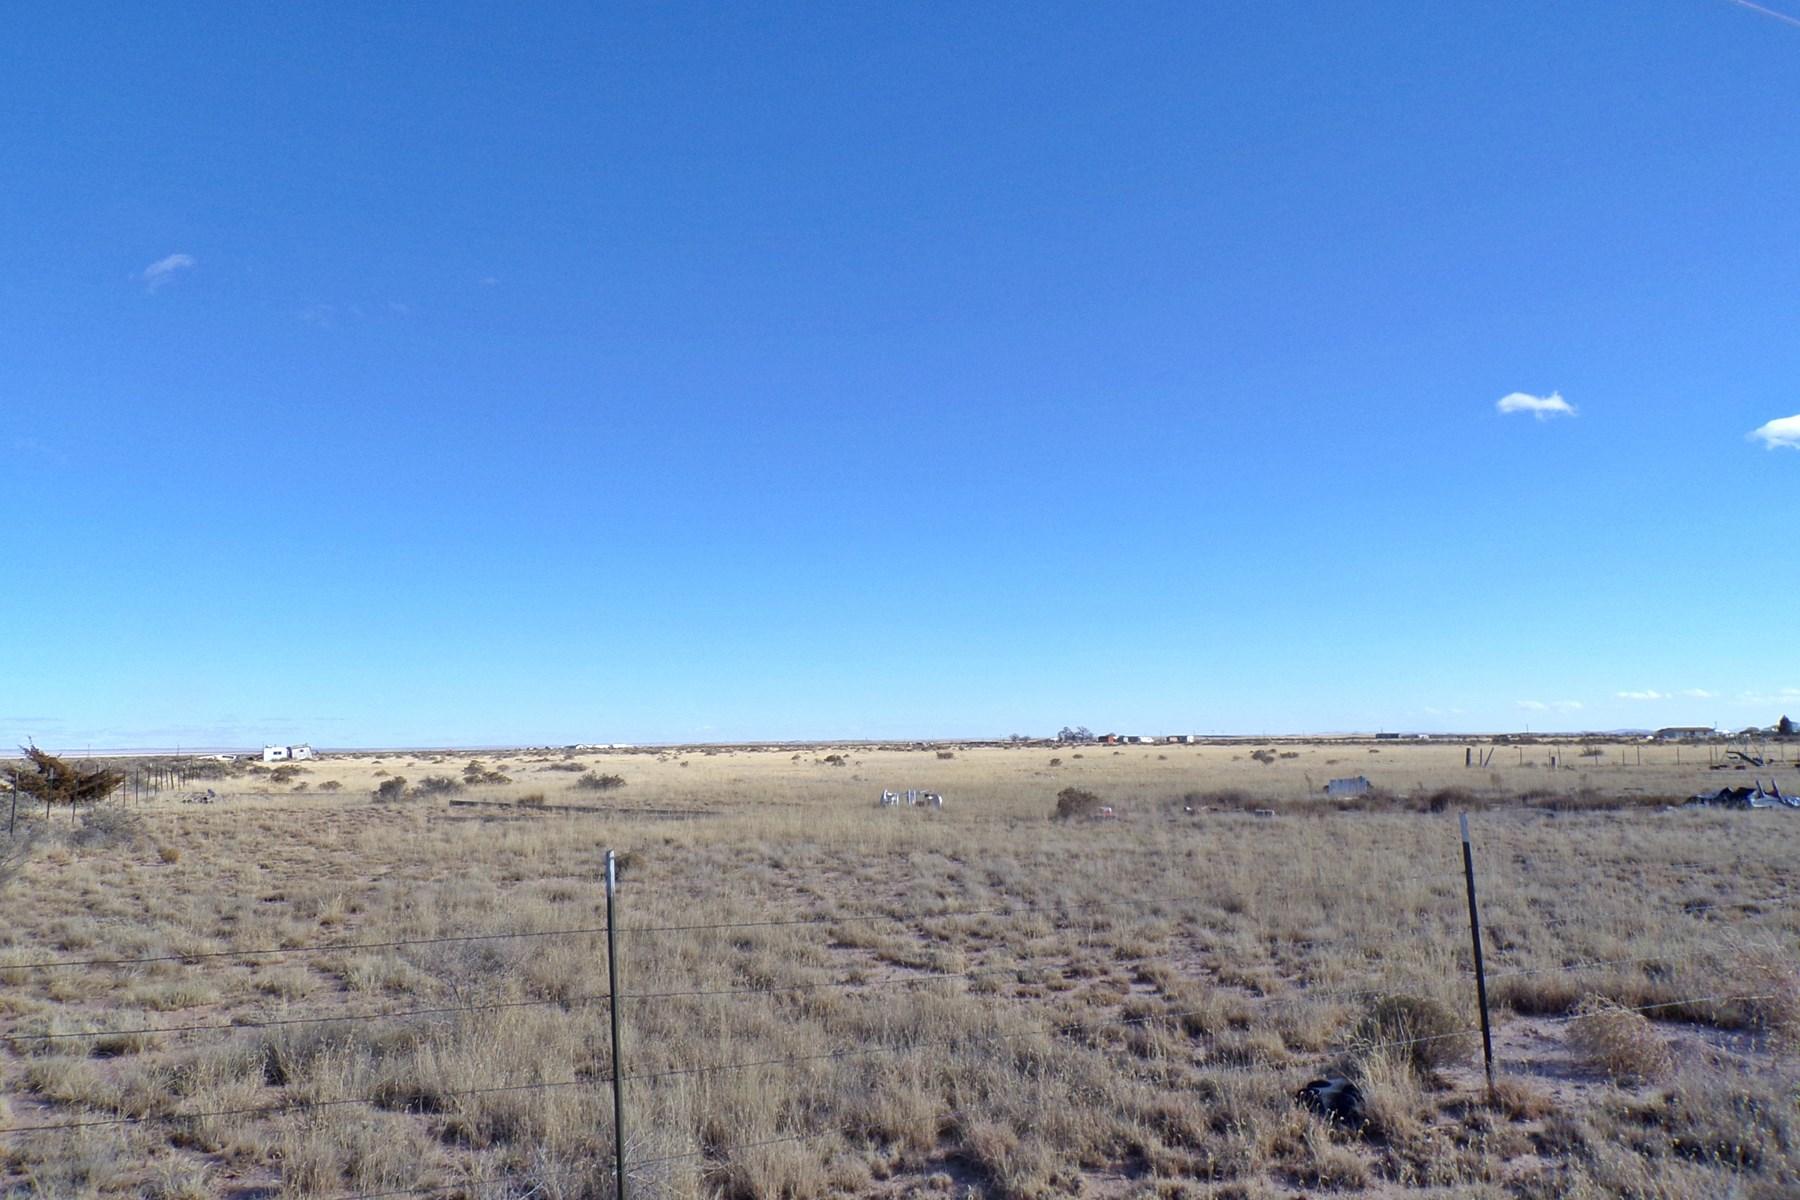 New Mexico 67 Ac Grazing Land For Sale near Estancia